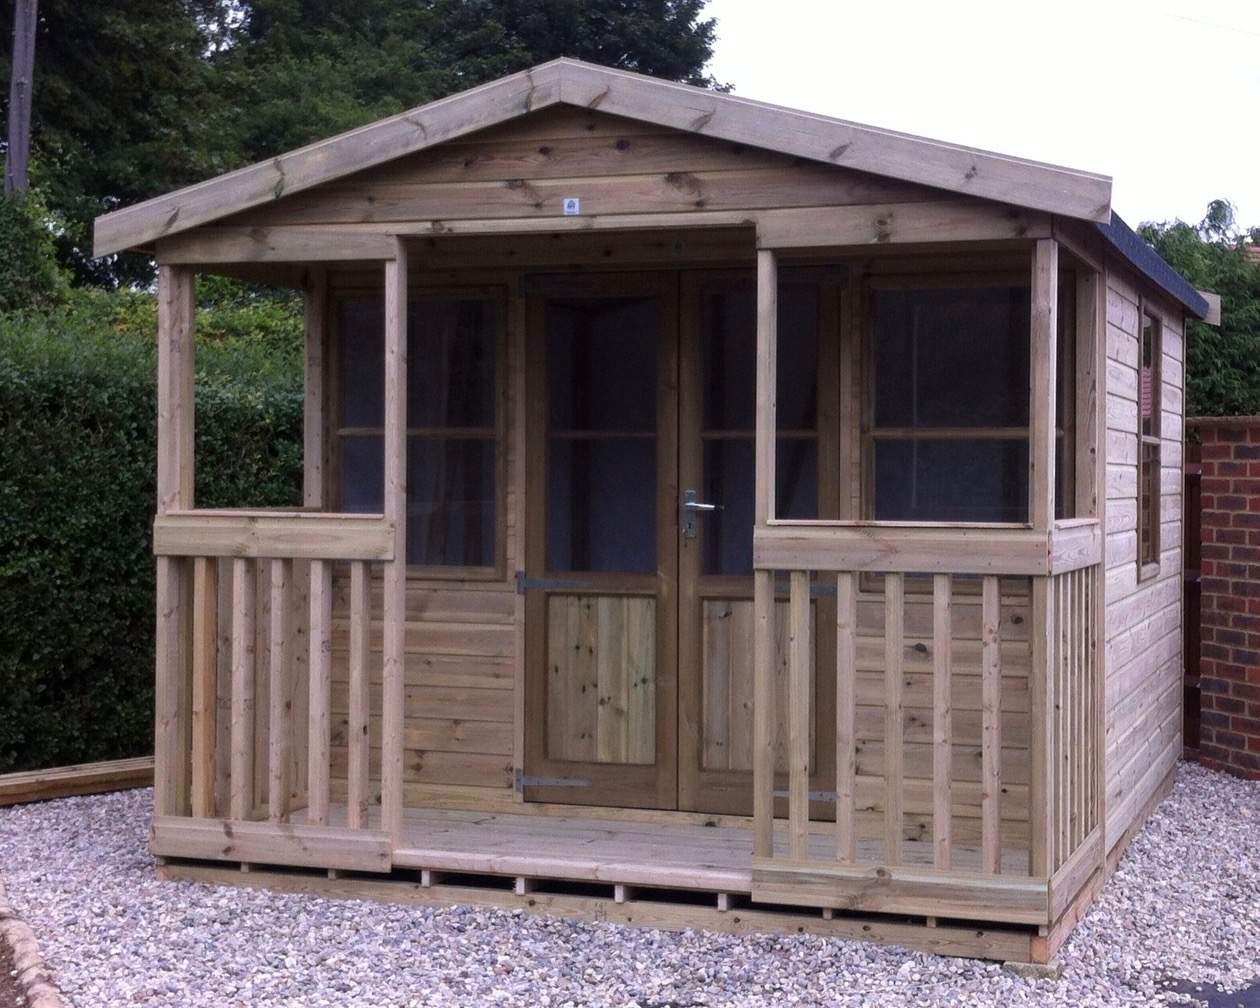 The Tonbridge Chalet Summerhouse